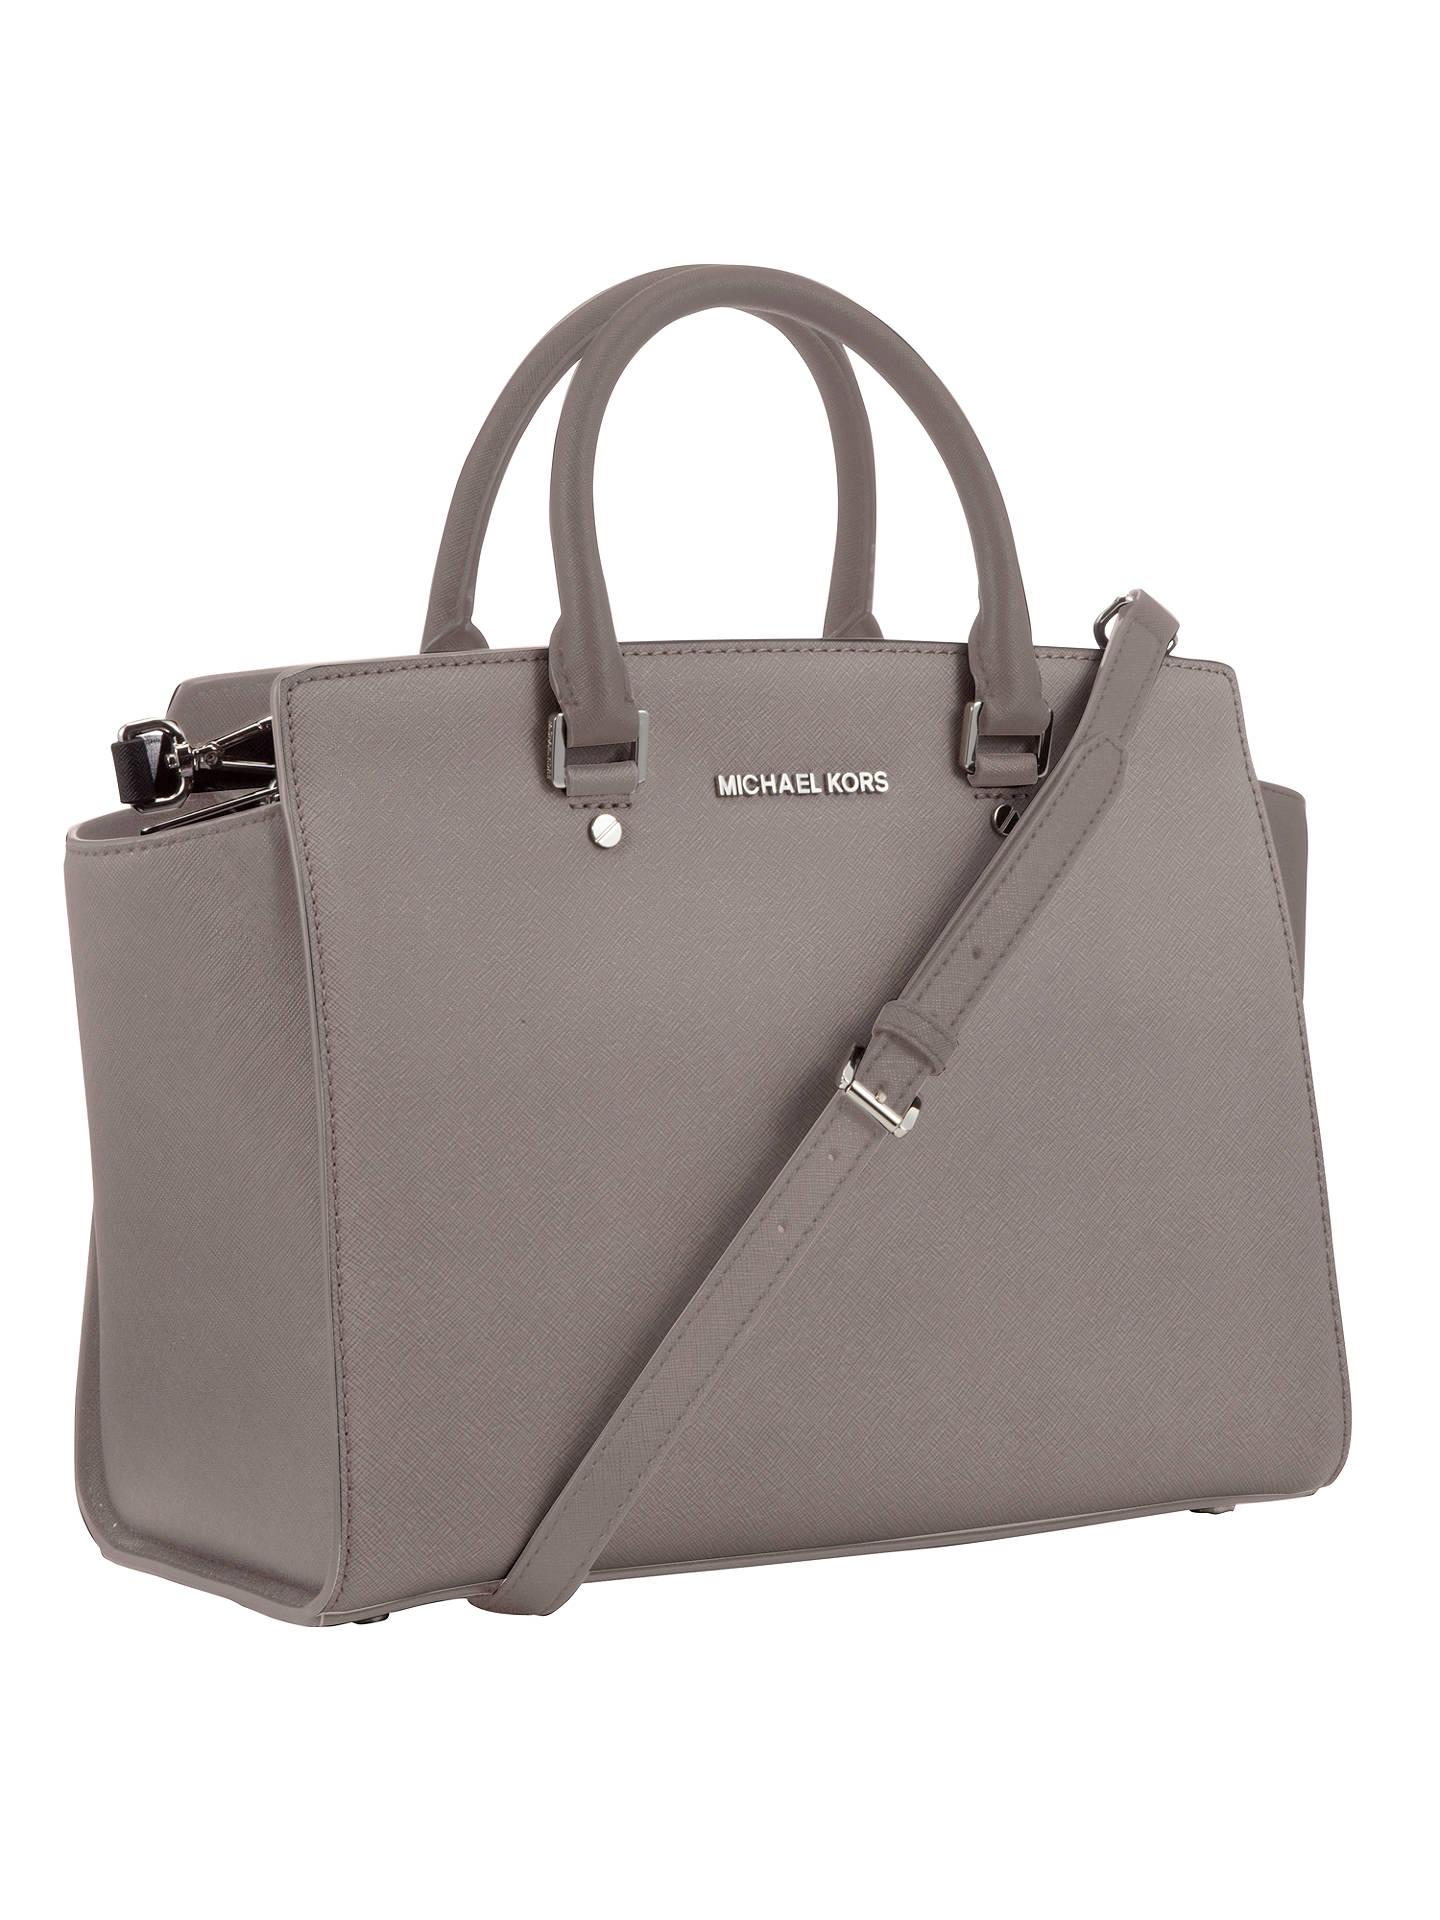 a95fae5063d10 ... buy buymichael michael kors selma large leather top zip satchel bag  grey online at johnlewis.